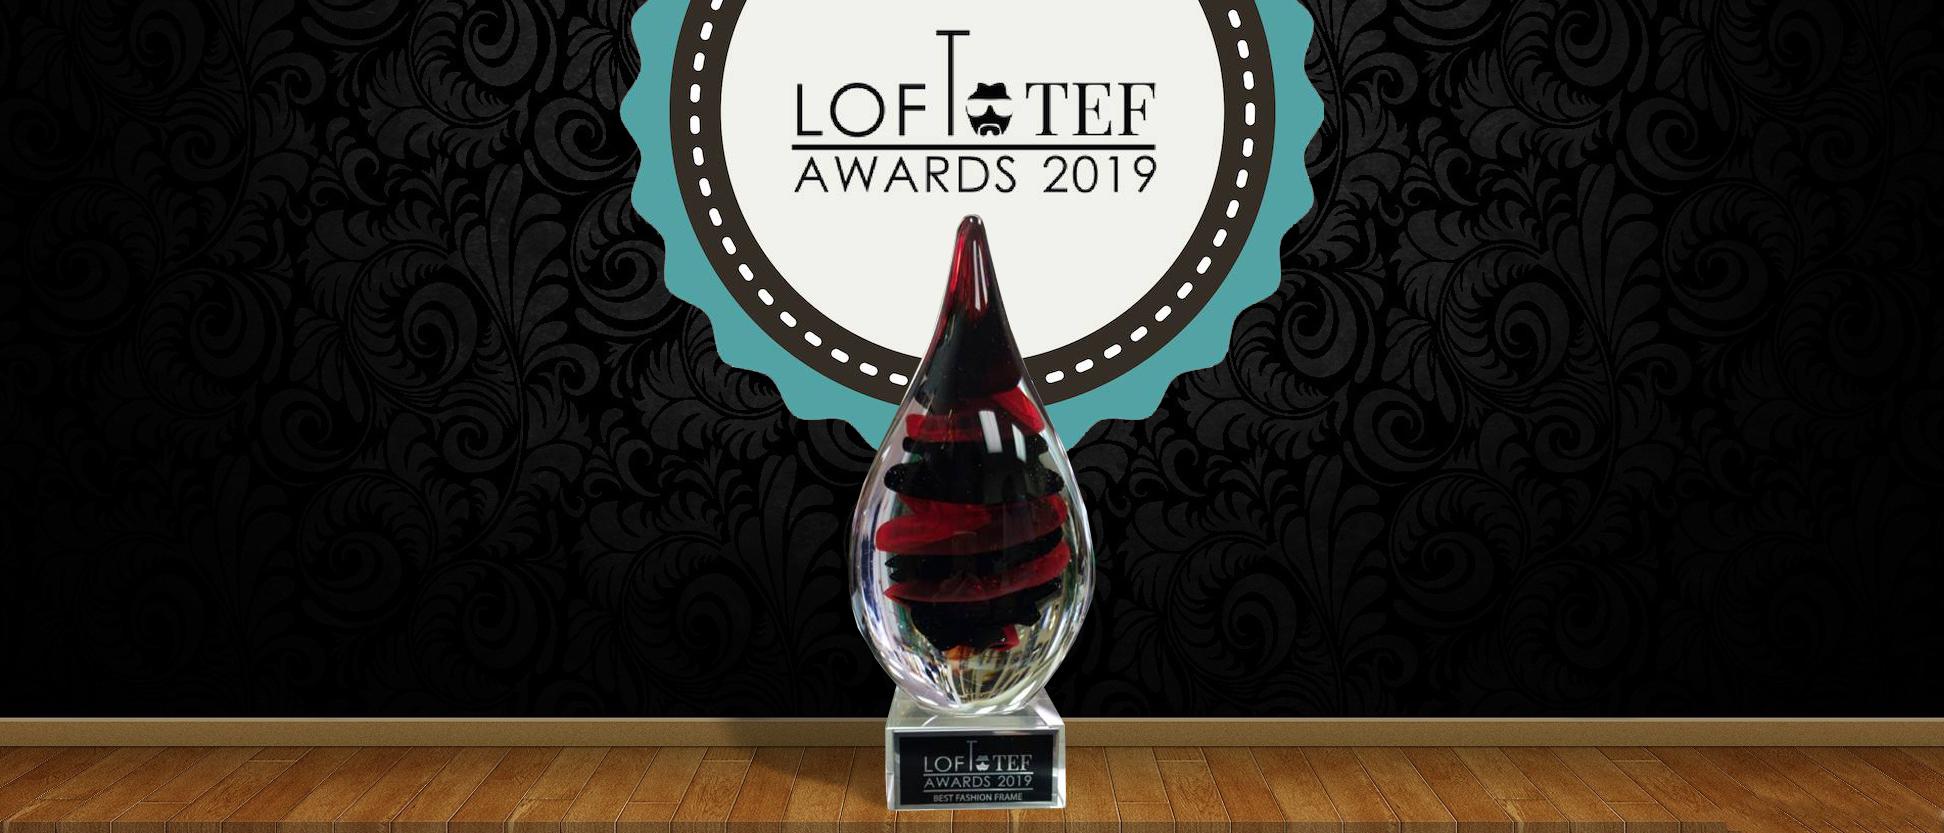 LOFTxTEF Awards – The winners